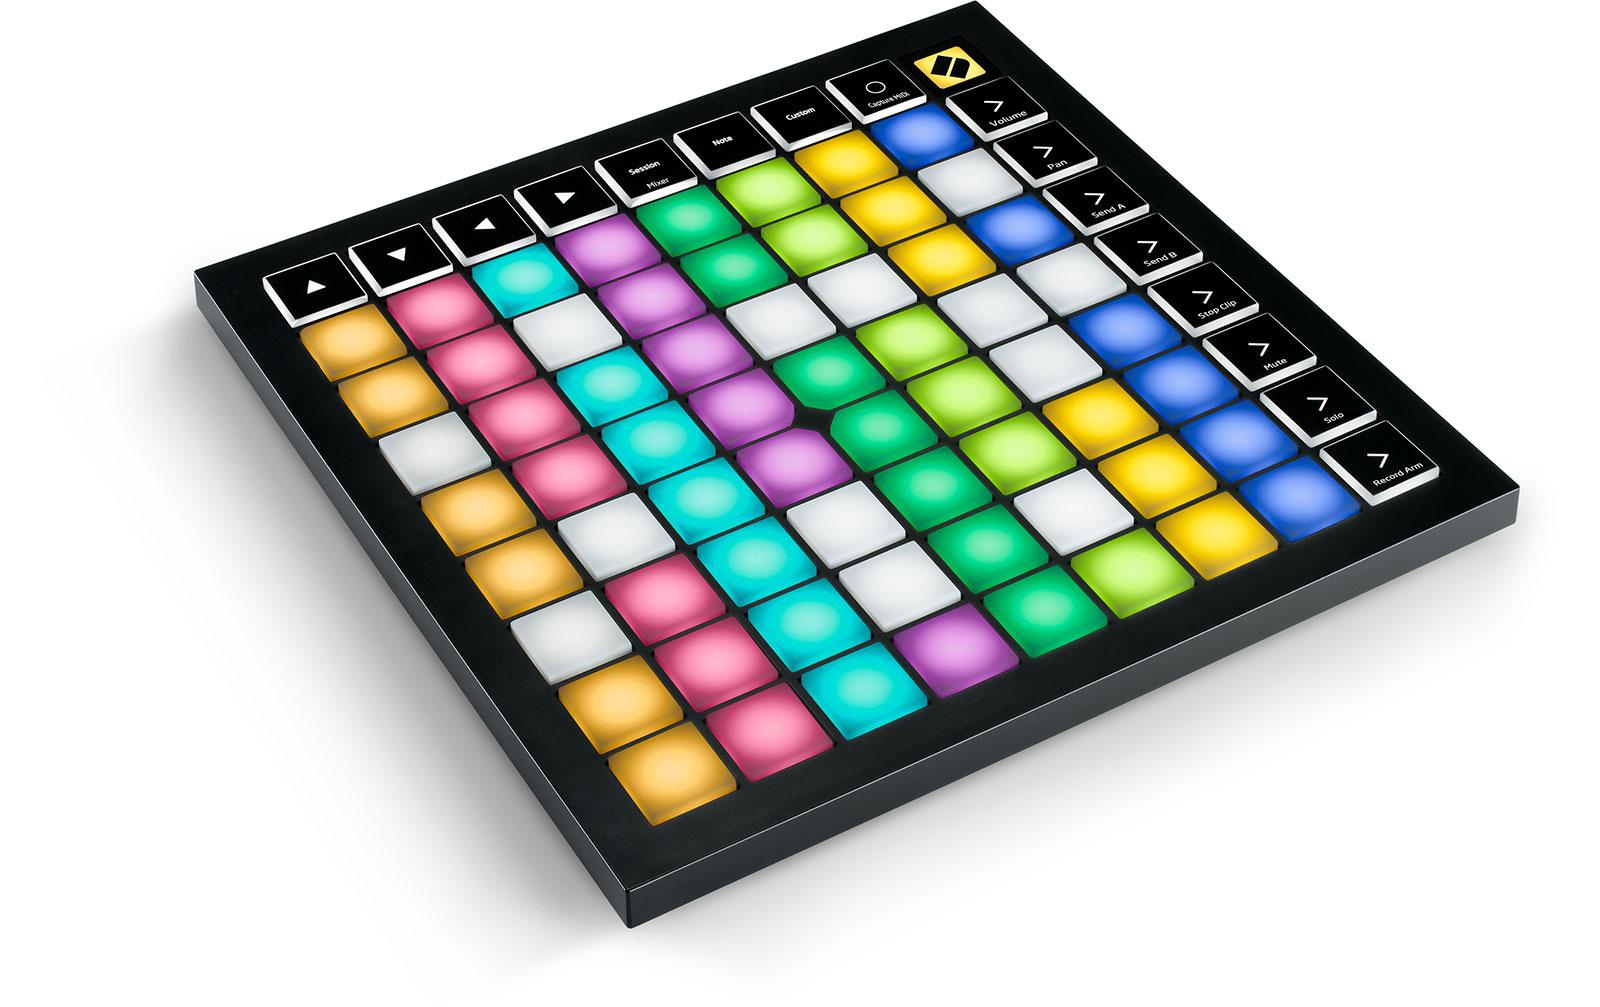 novation-launchpad-x